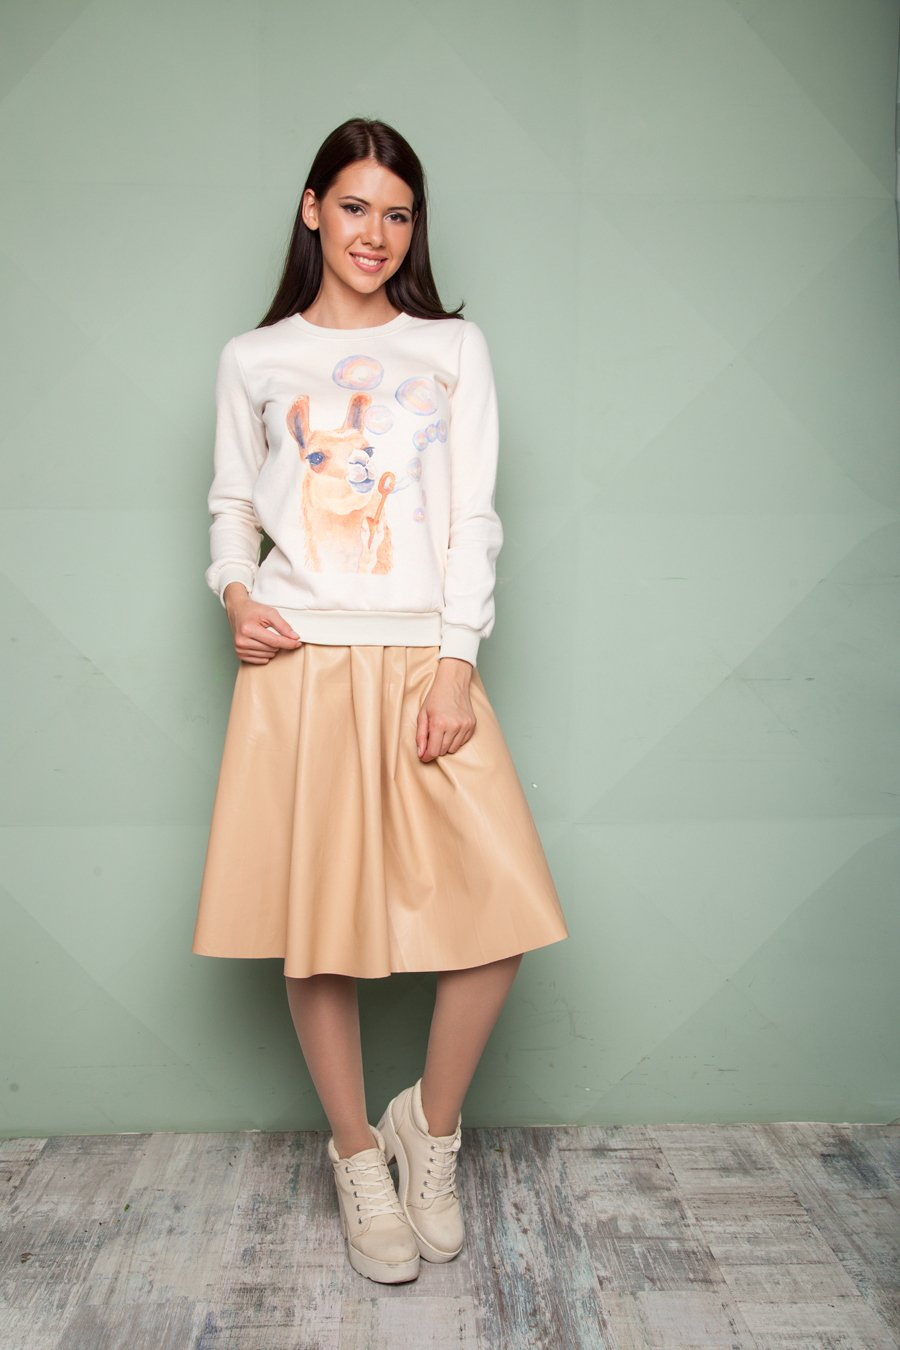 Толстовка и юбка картинки